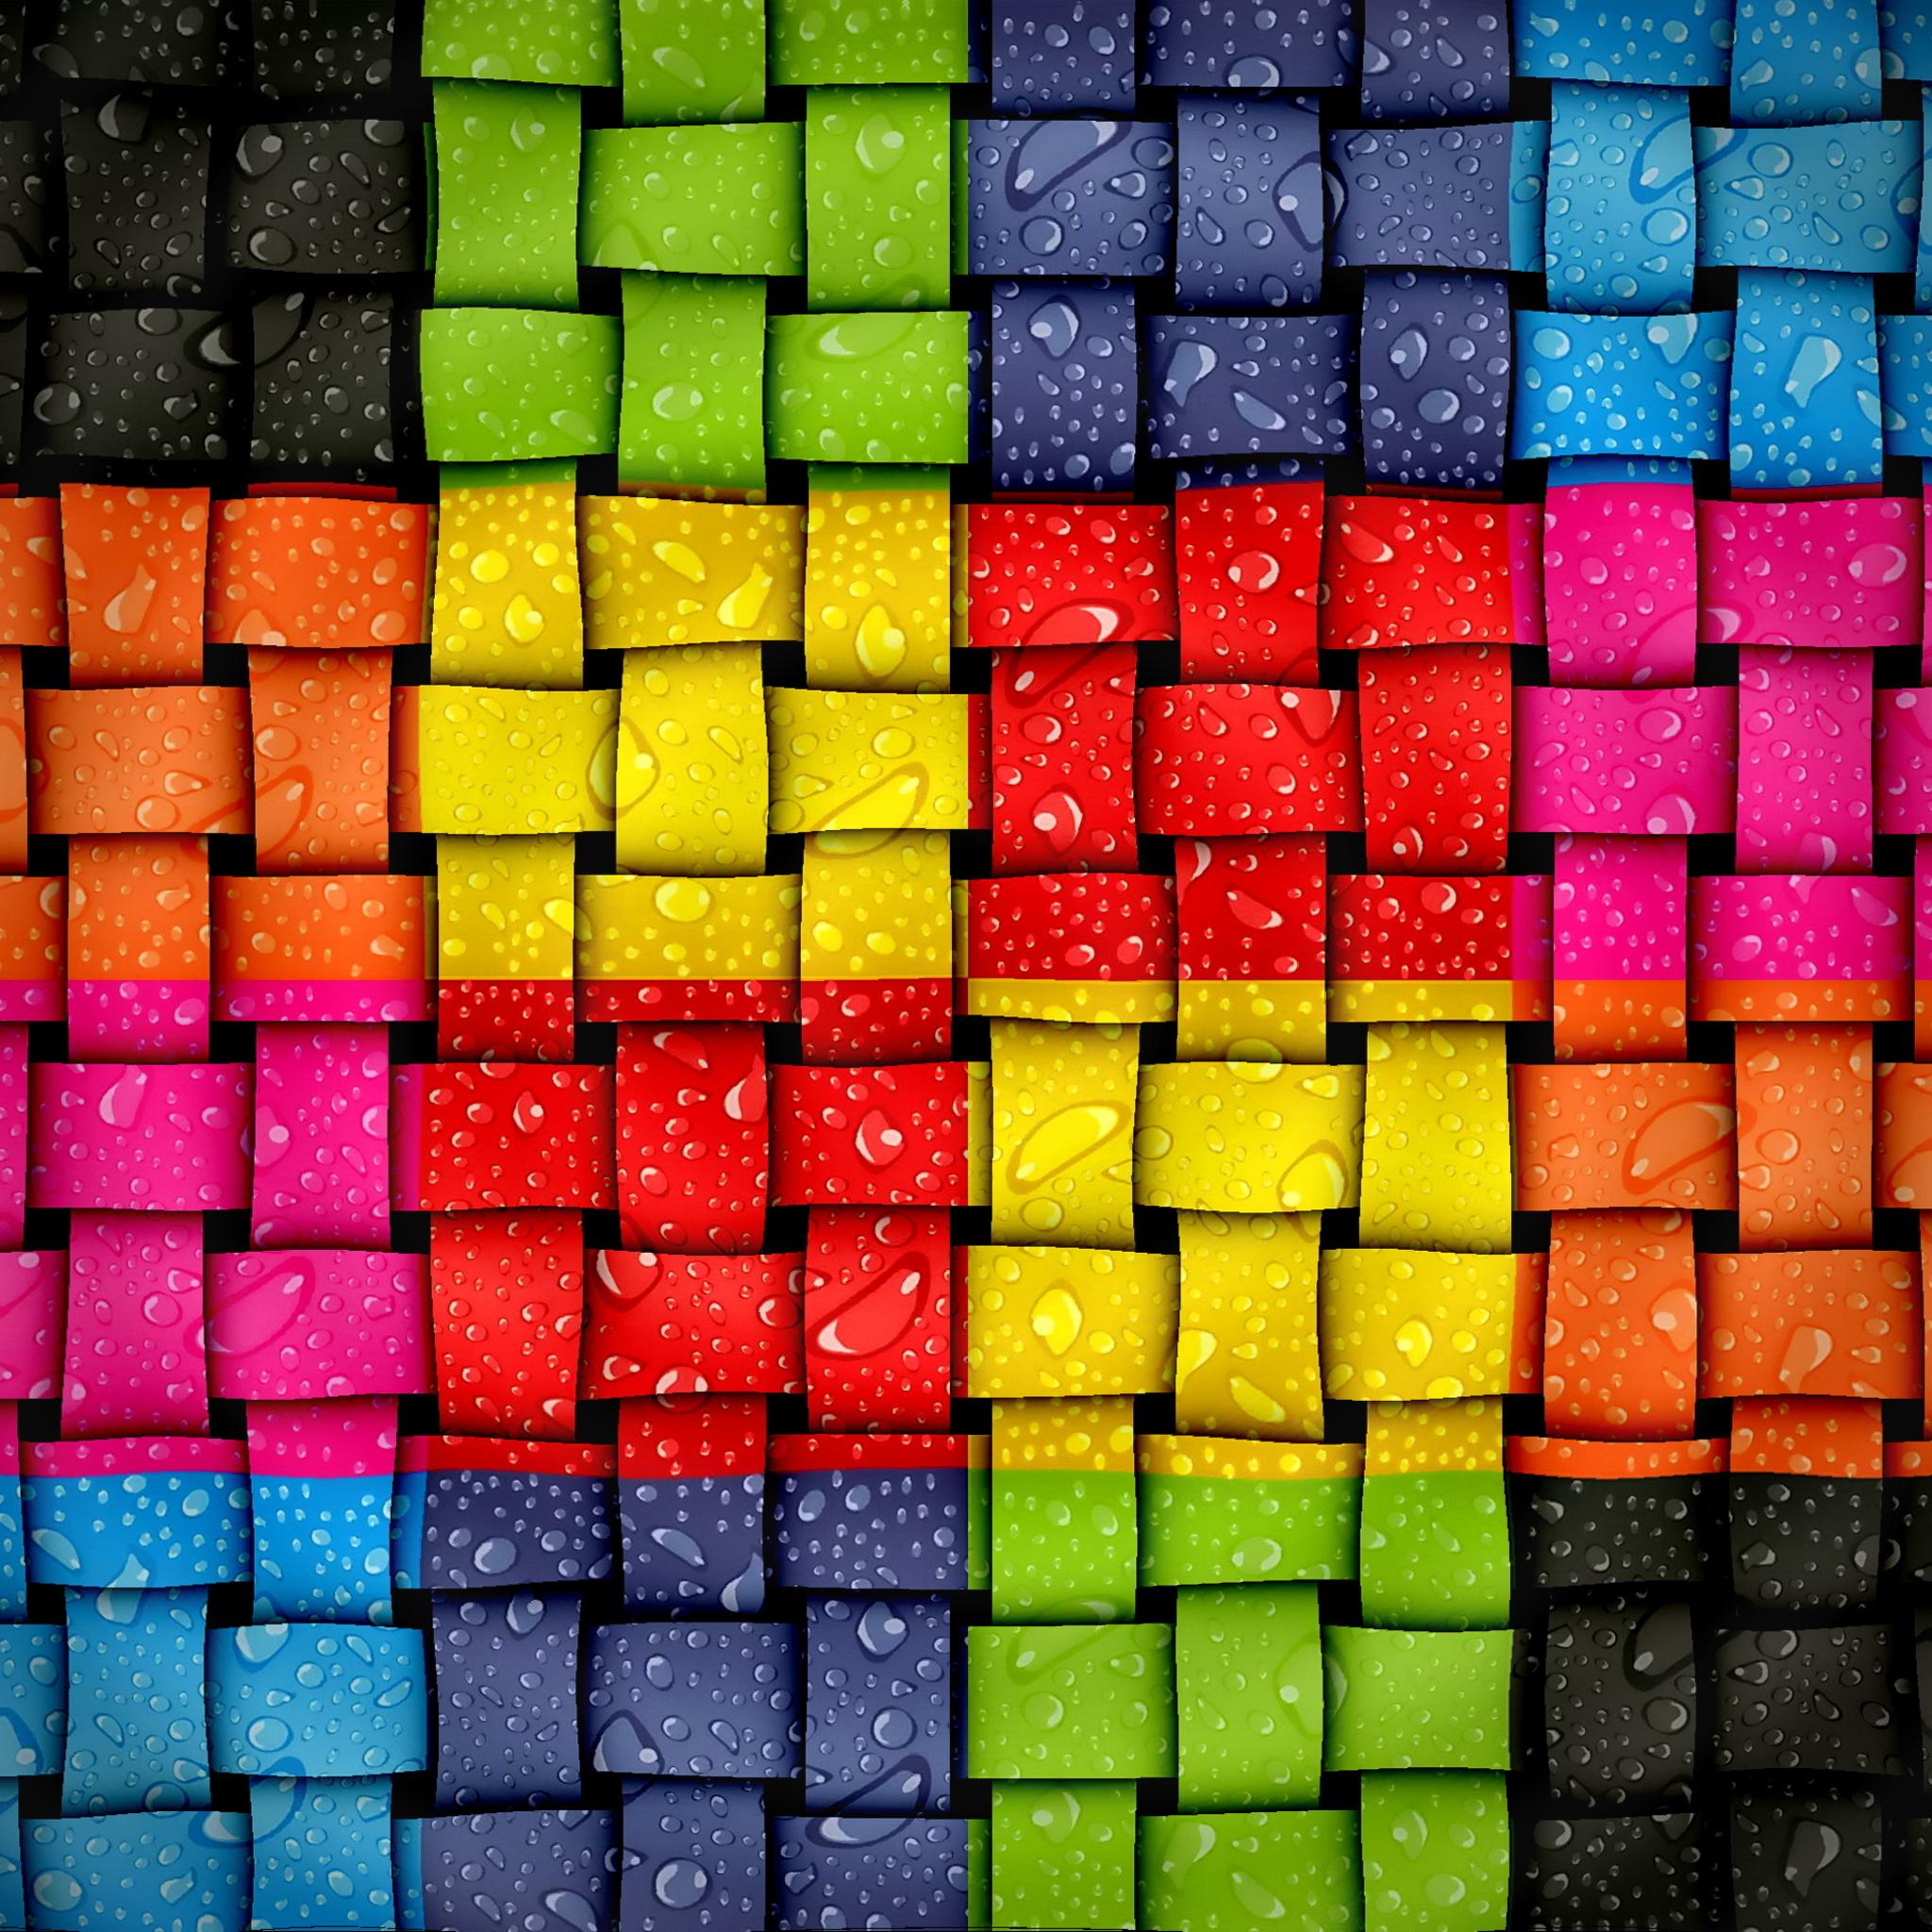 my ipad wallpaper hd live colors 9 2048x2048 ipad wallpaperspictures 2048x2048